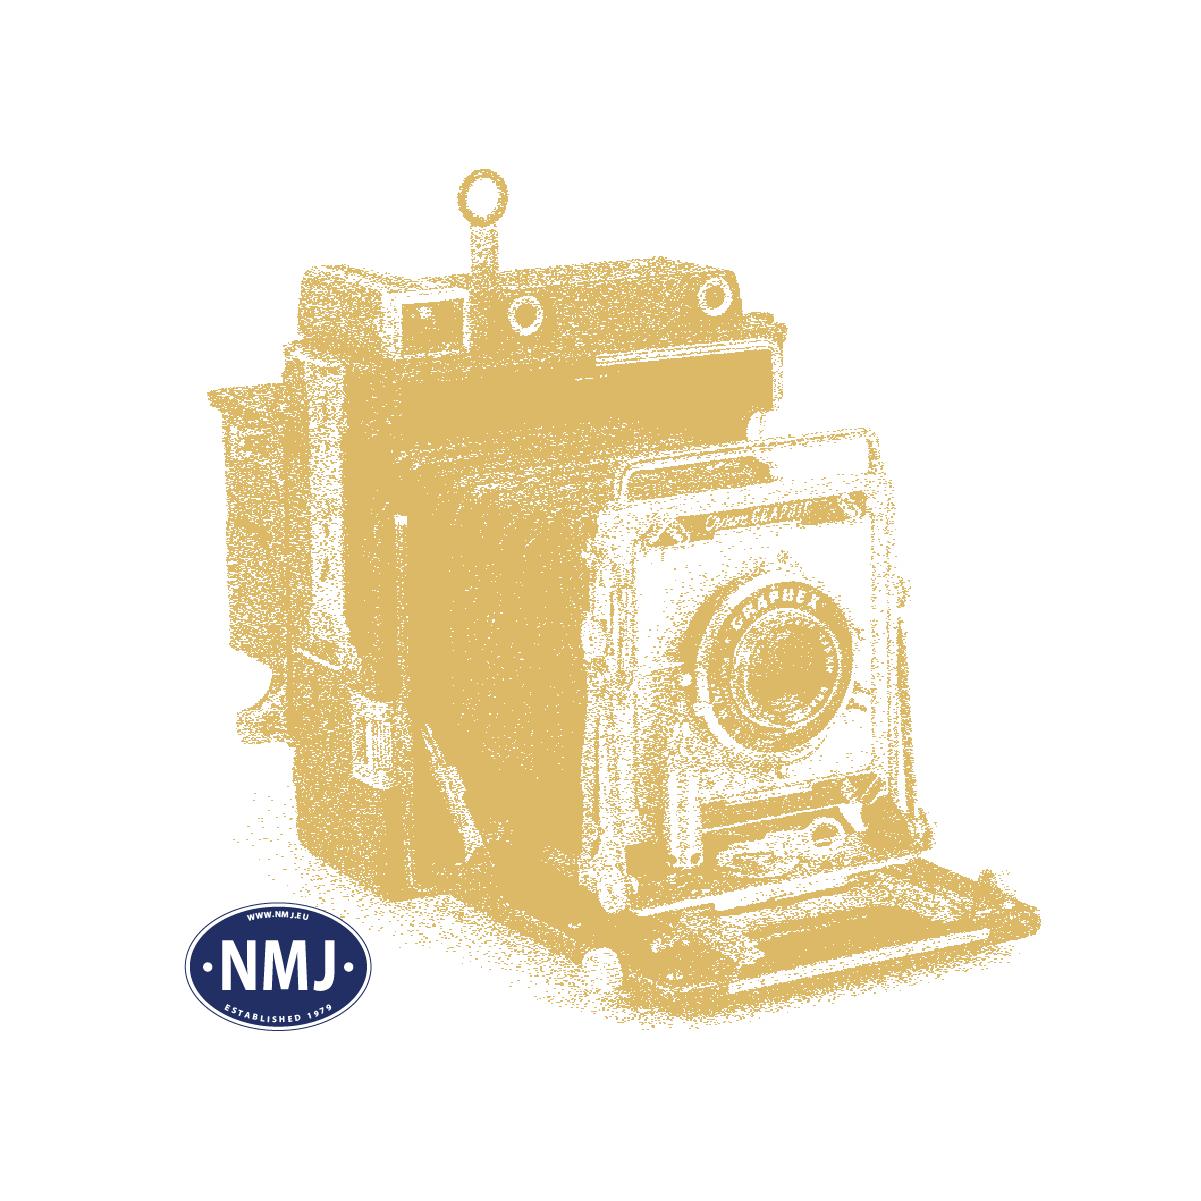 NMJ Topline NSB SKD224.217, Rød/gul, DCC Digital